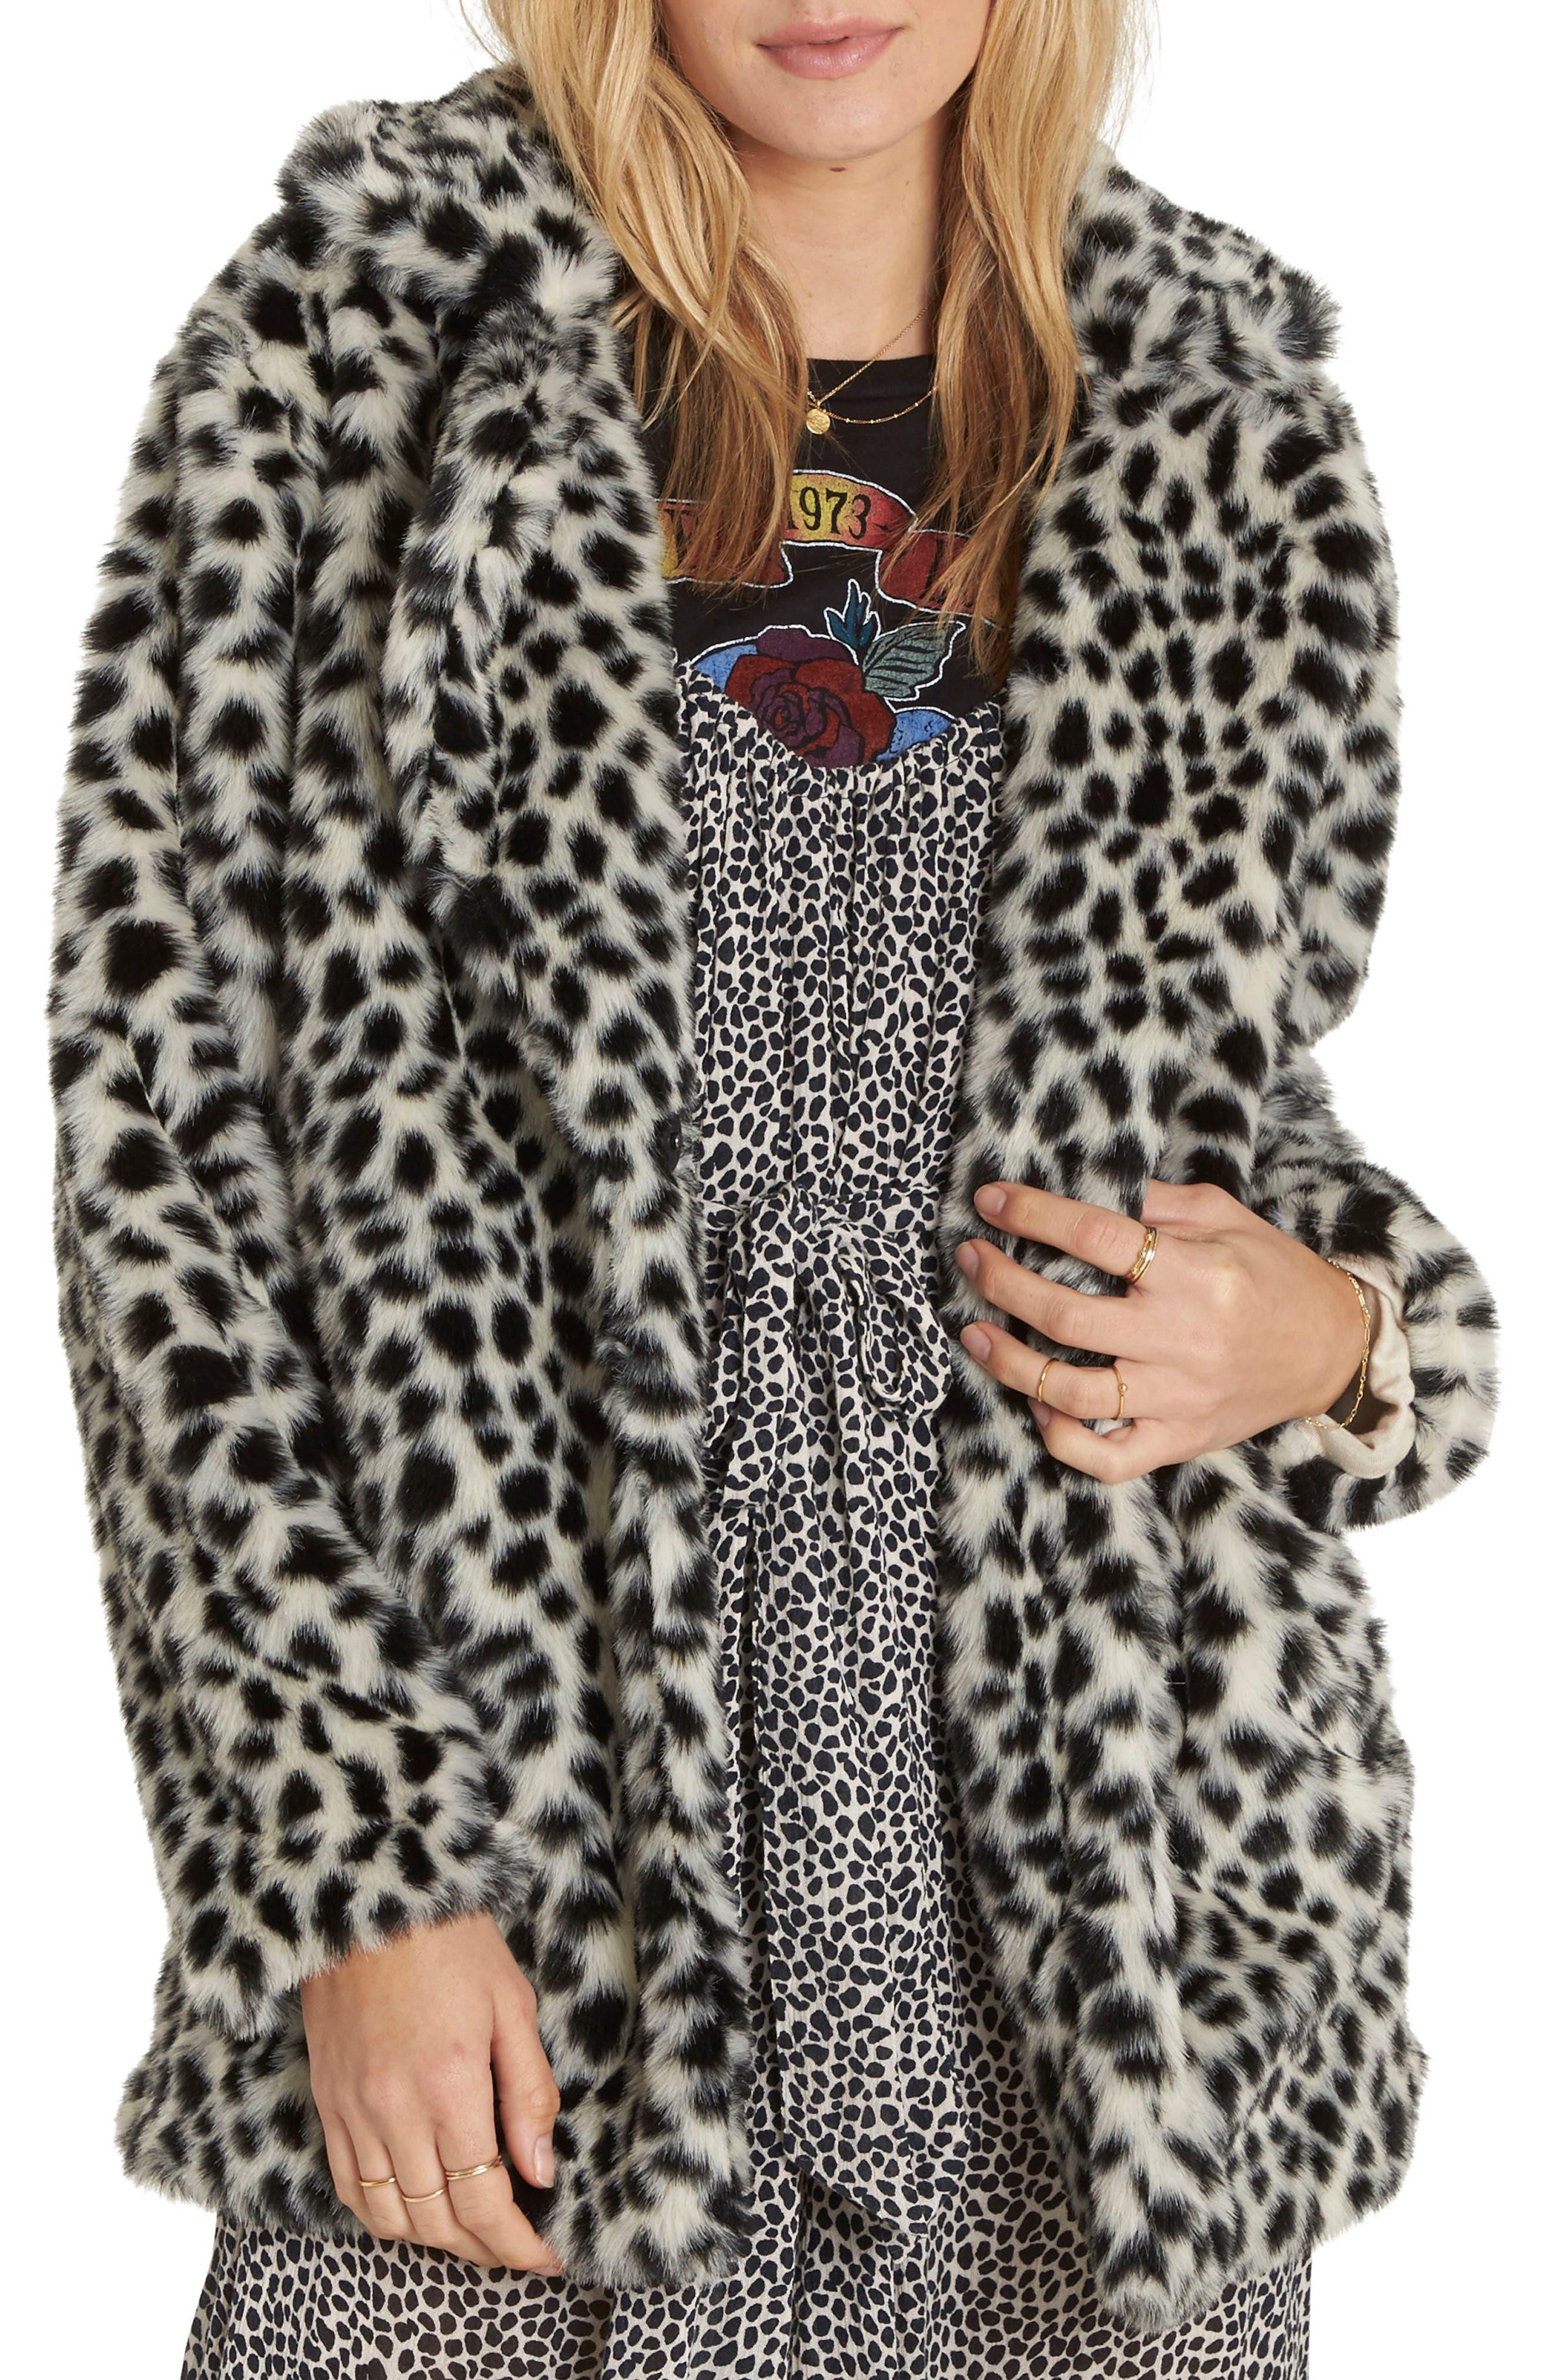 Wild One Faux Fur Coat,                             Main thumbnail 1, color,                             Cheetah